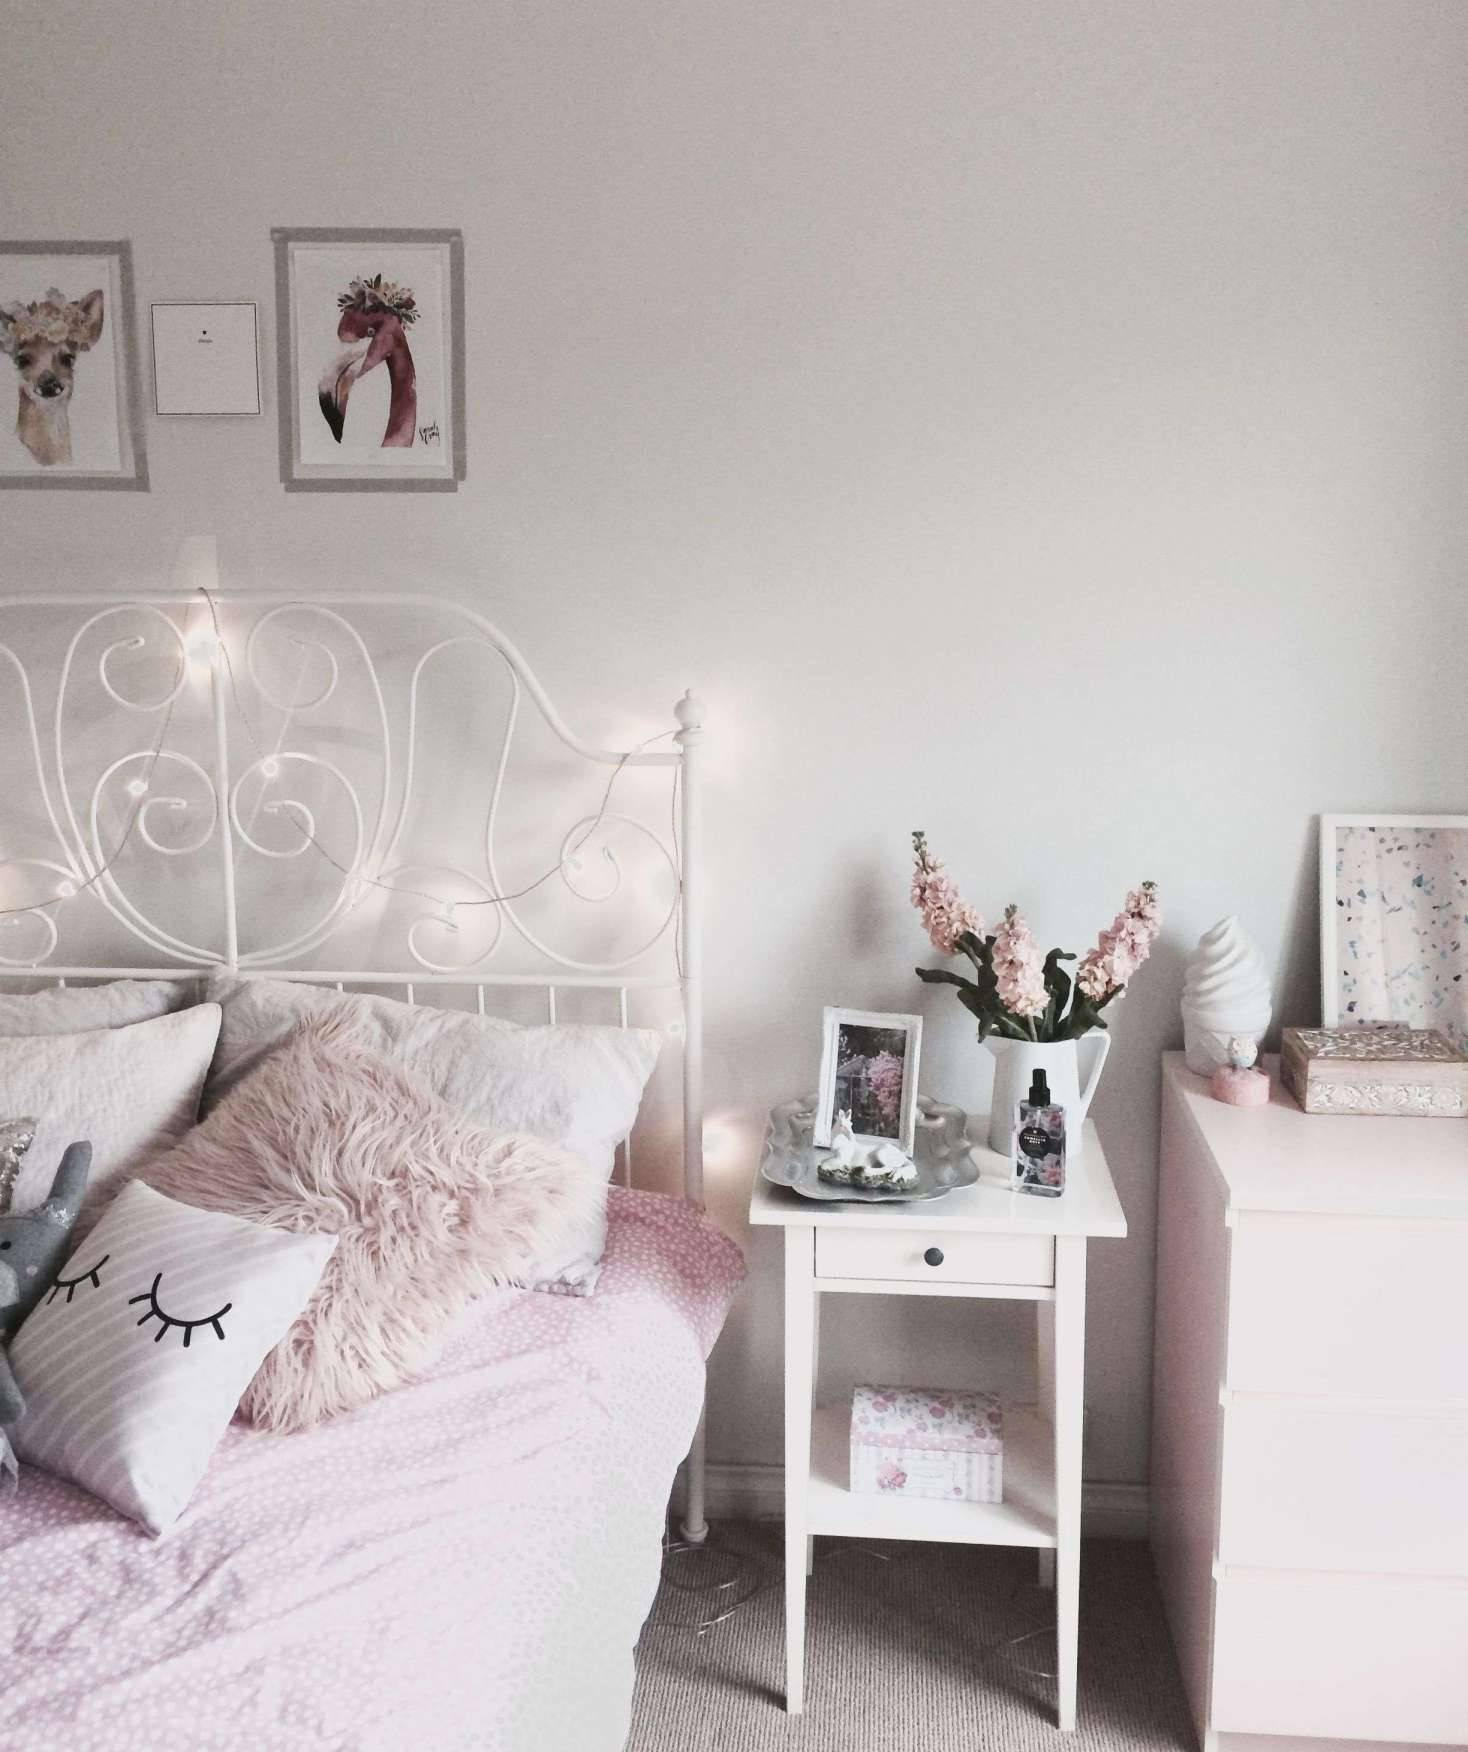 teenage girl bedroom ideas cheap lovely bedroom decorating ideas for teenage girls inspirational ideas teen of teenage girl bedroom ideas cheap